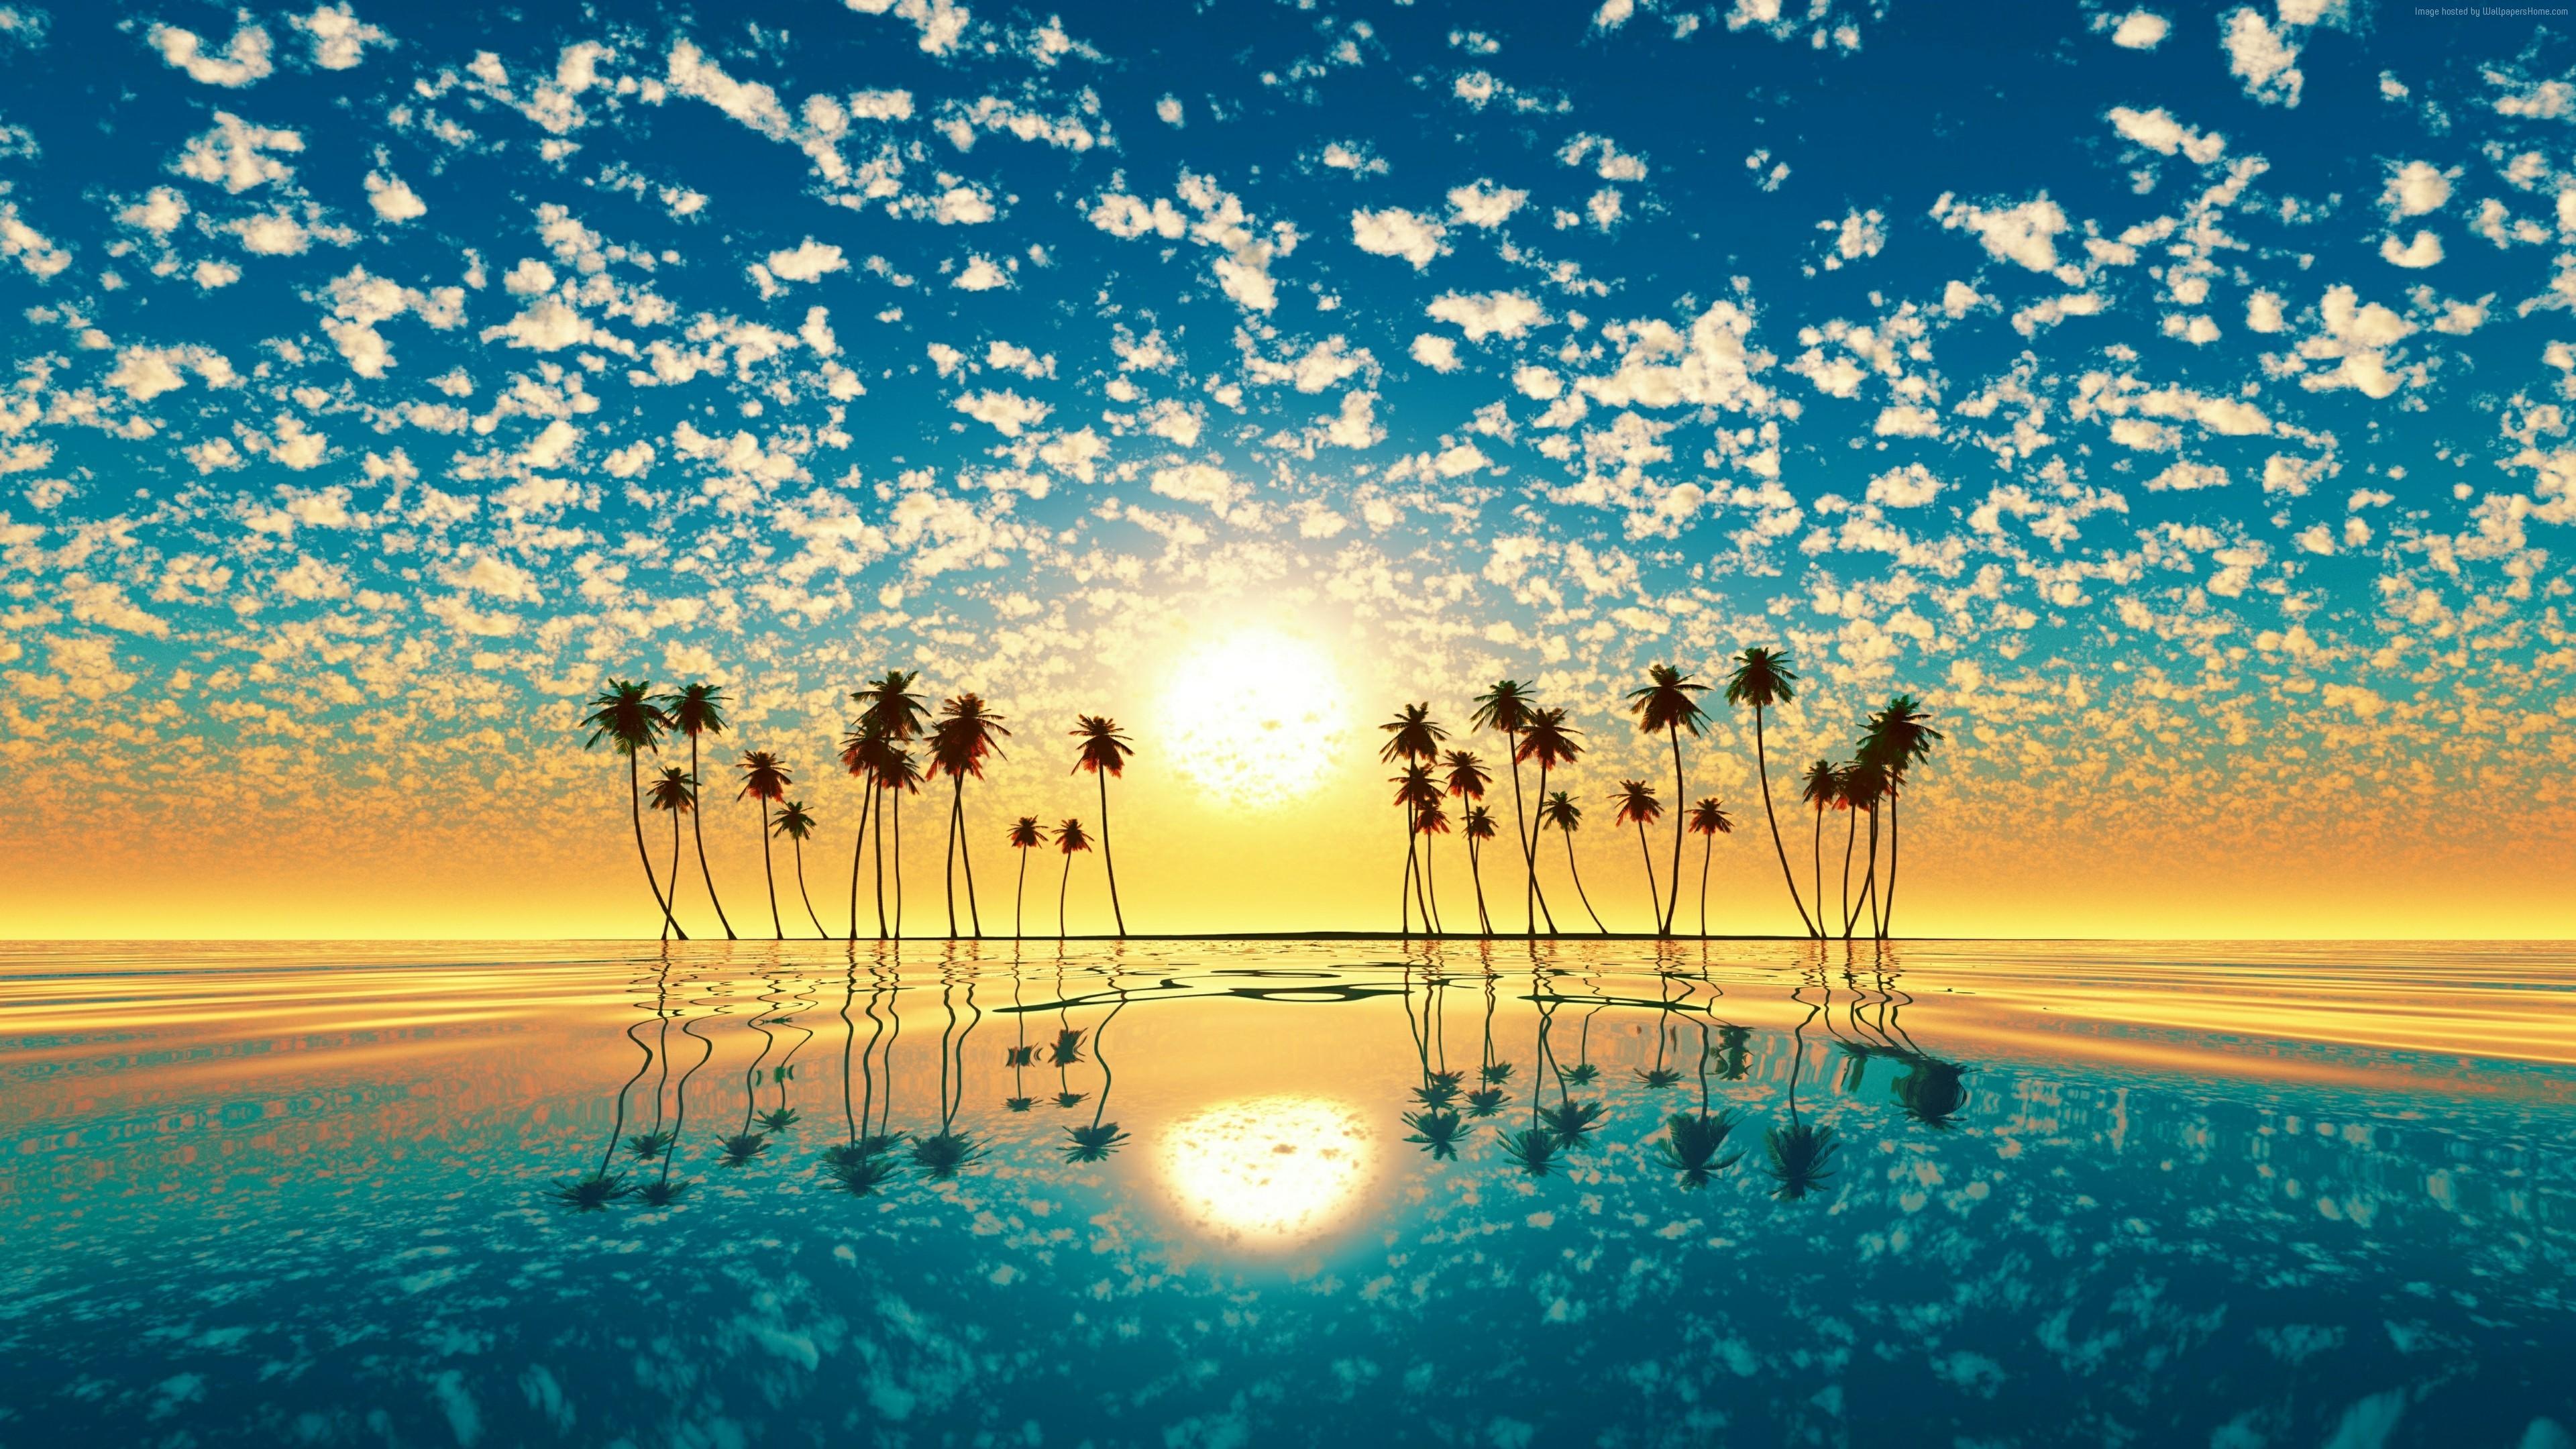 #4k, #horizon, #sea, #sunset - Palm Trees Sunset Wallpaper Hd , HD Wallpaper & Backgrounds